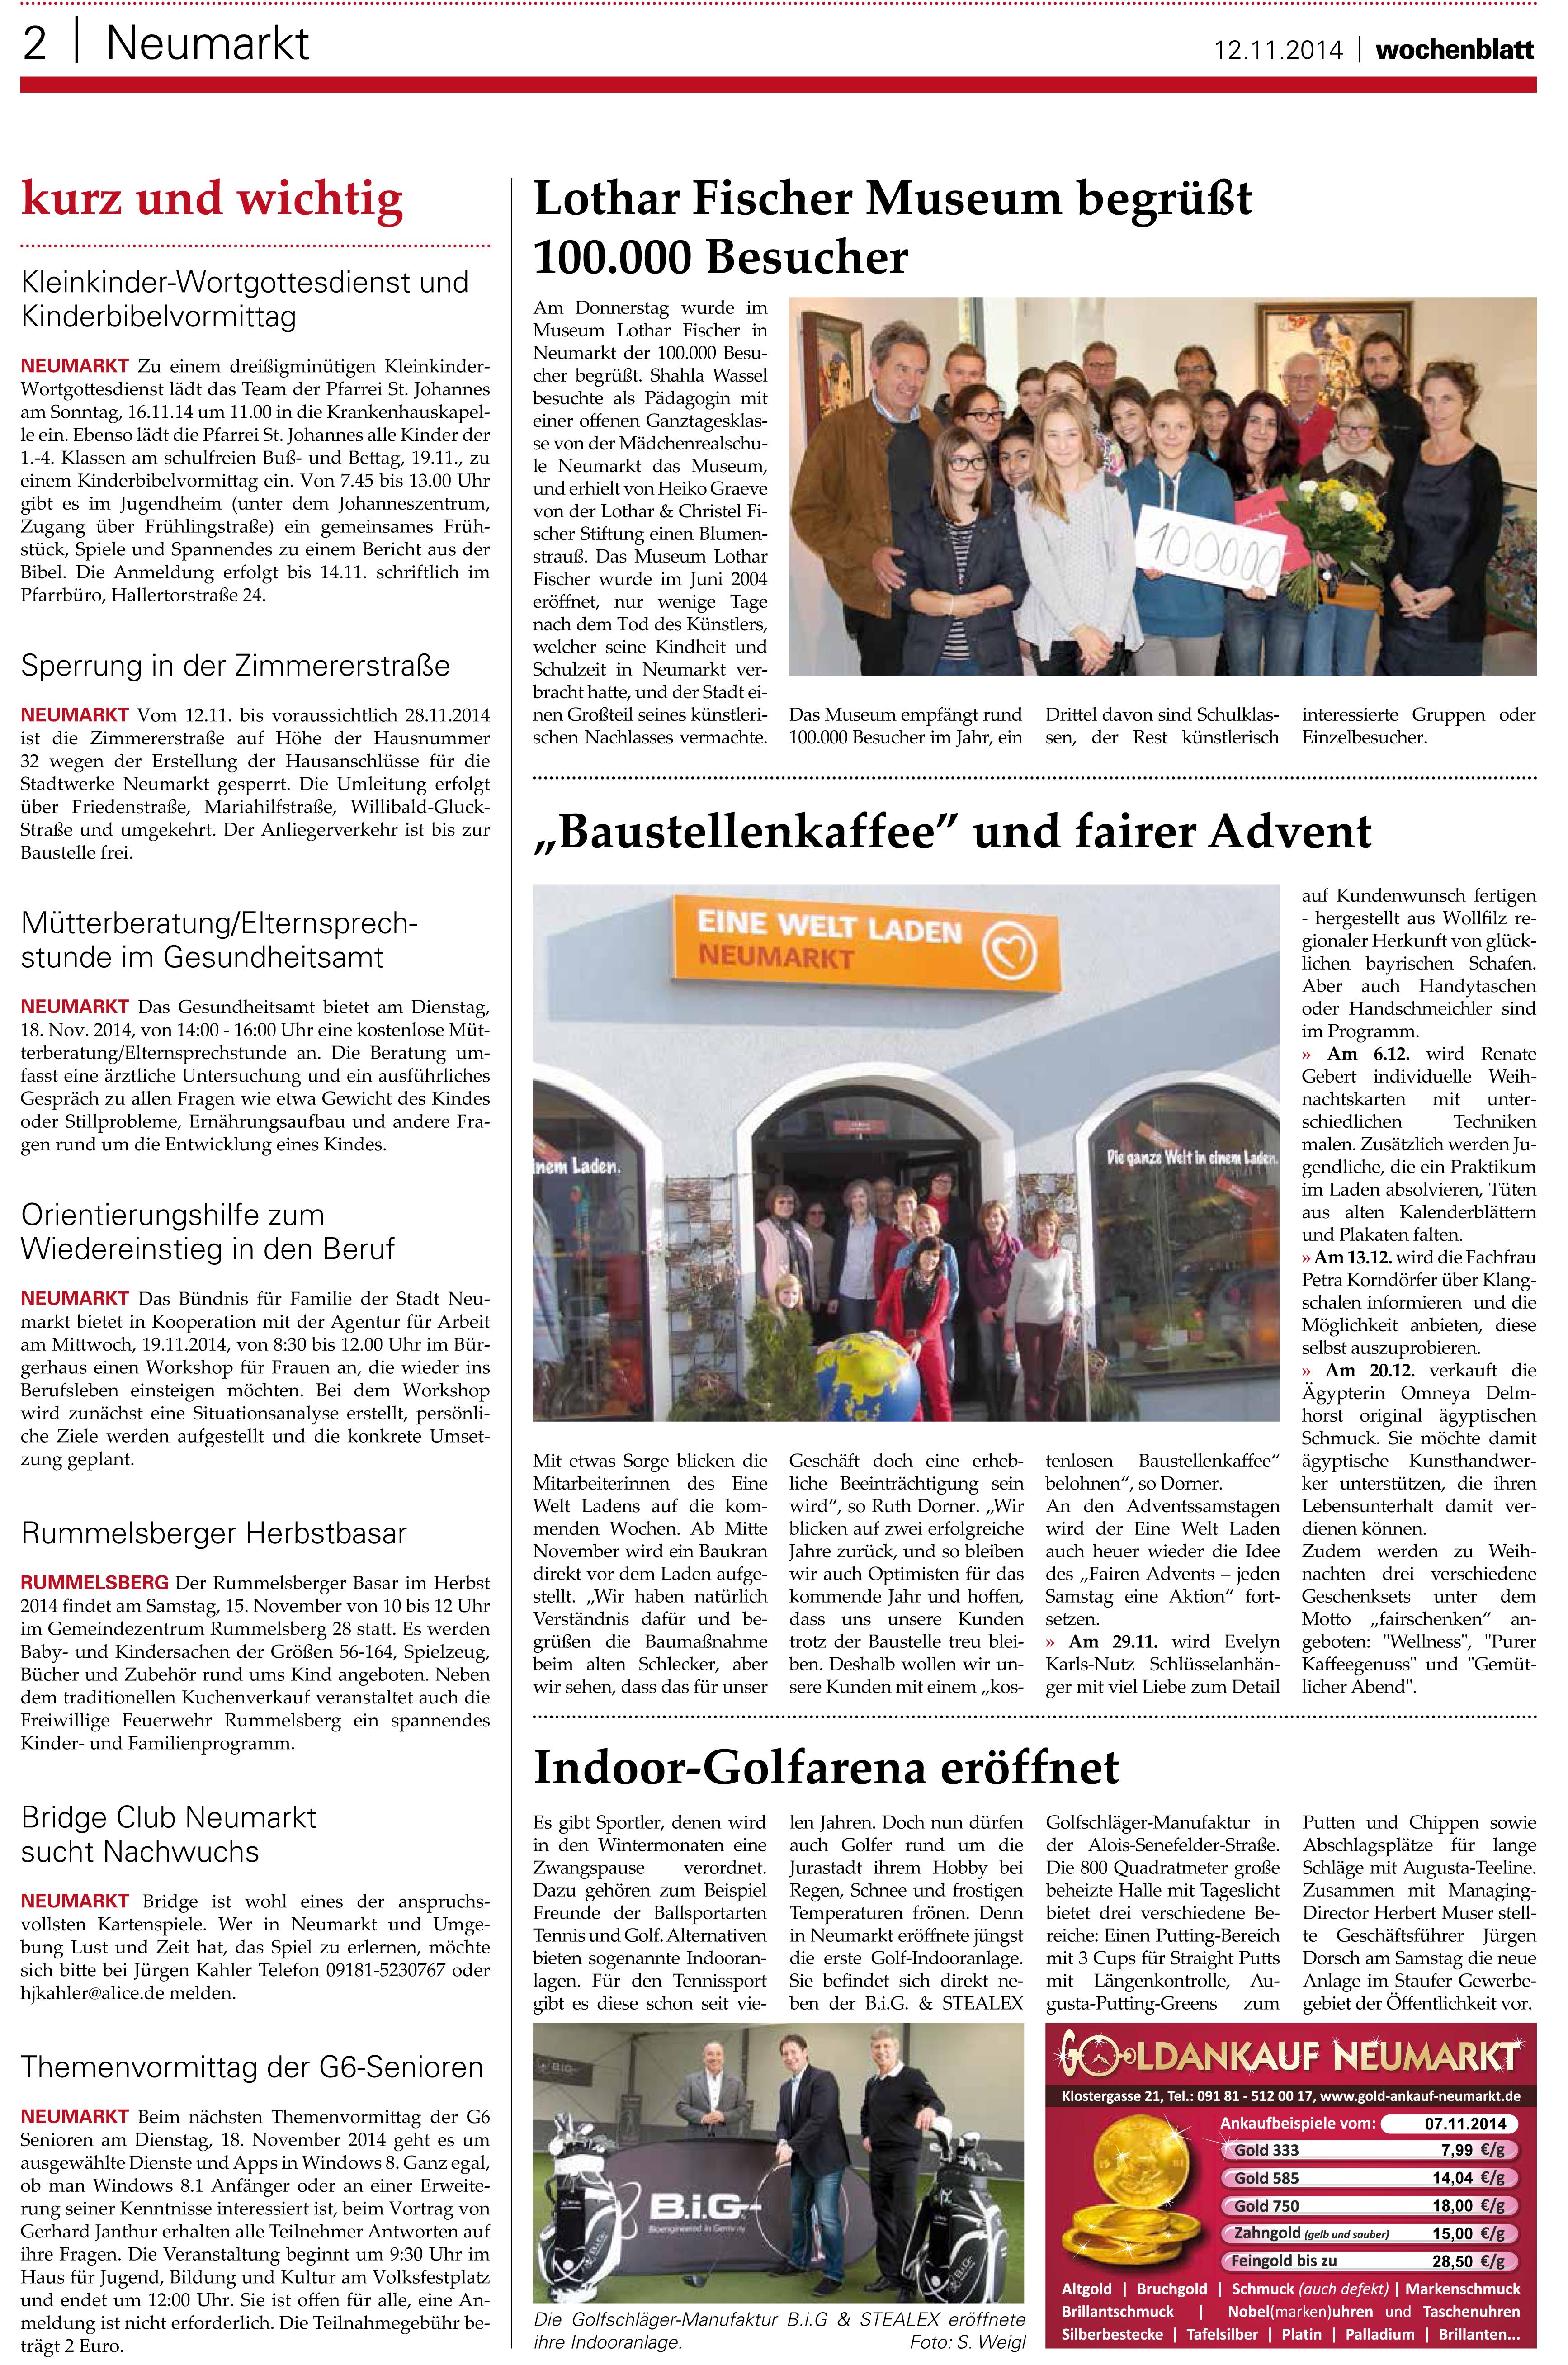 Neumarkter Wochenblatt